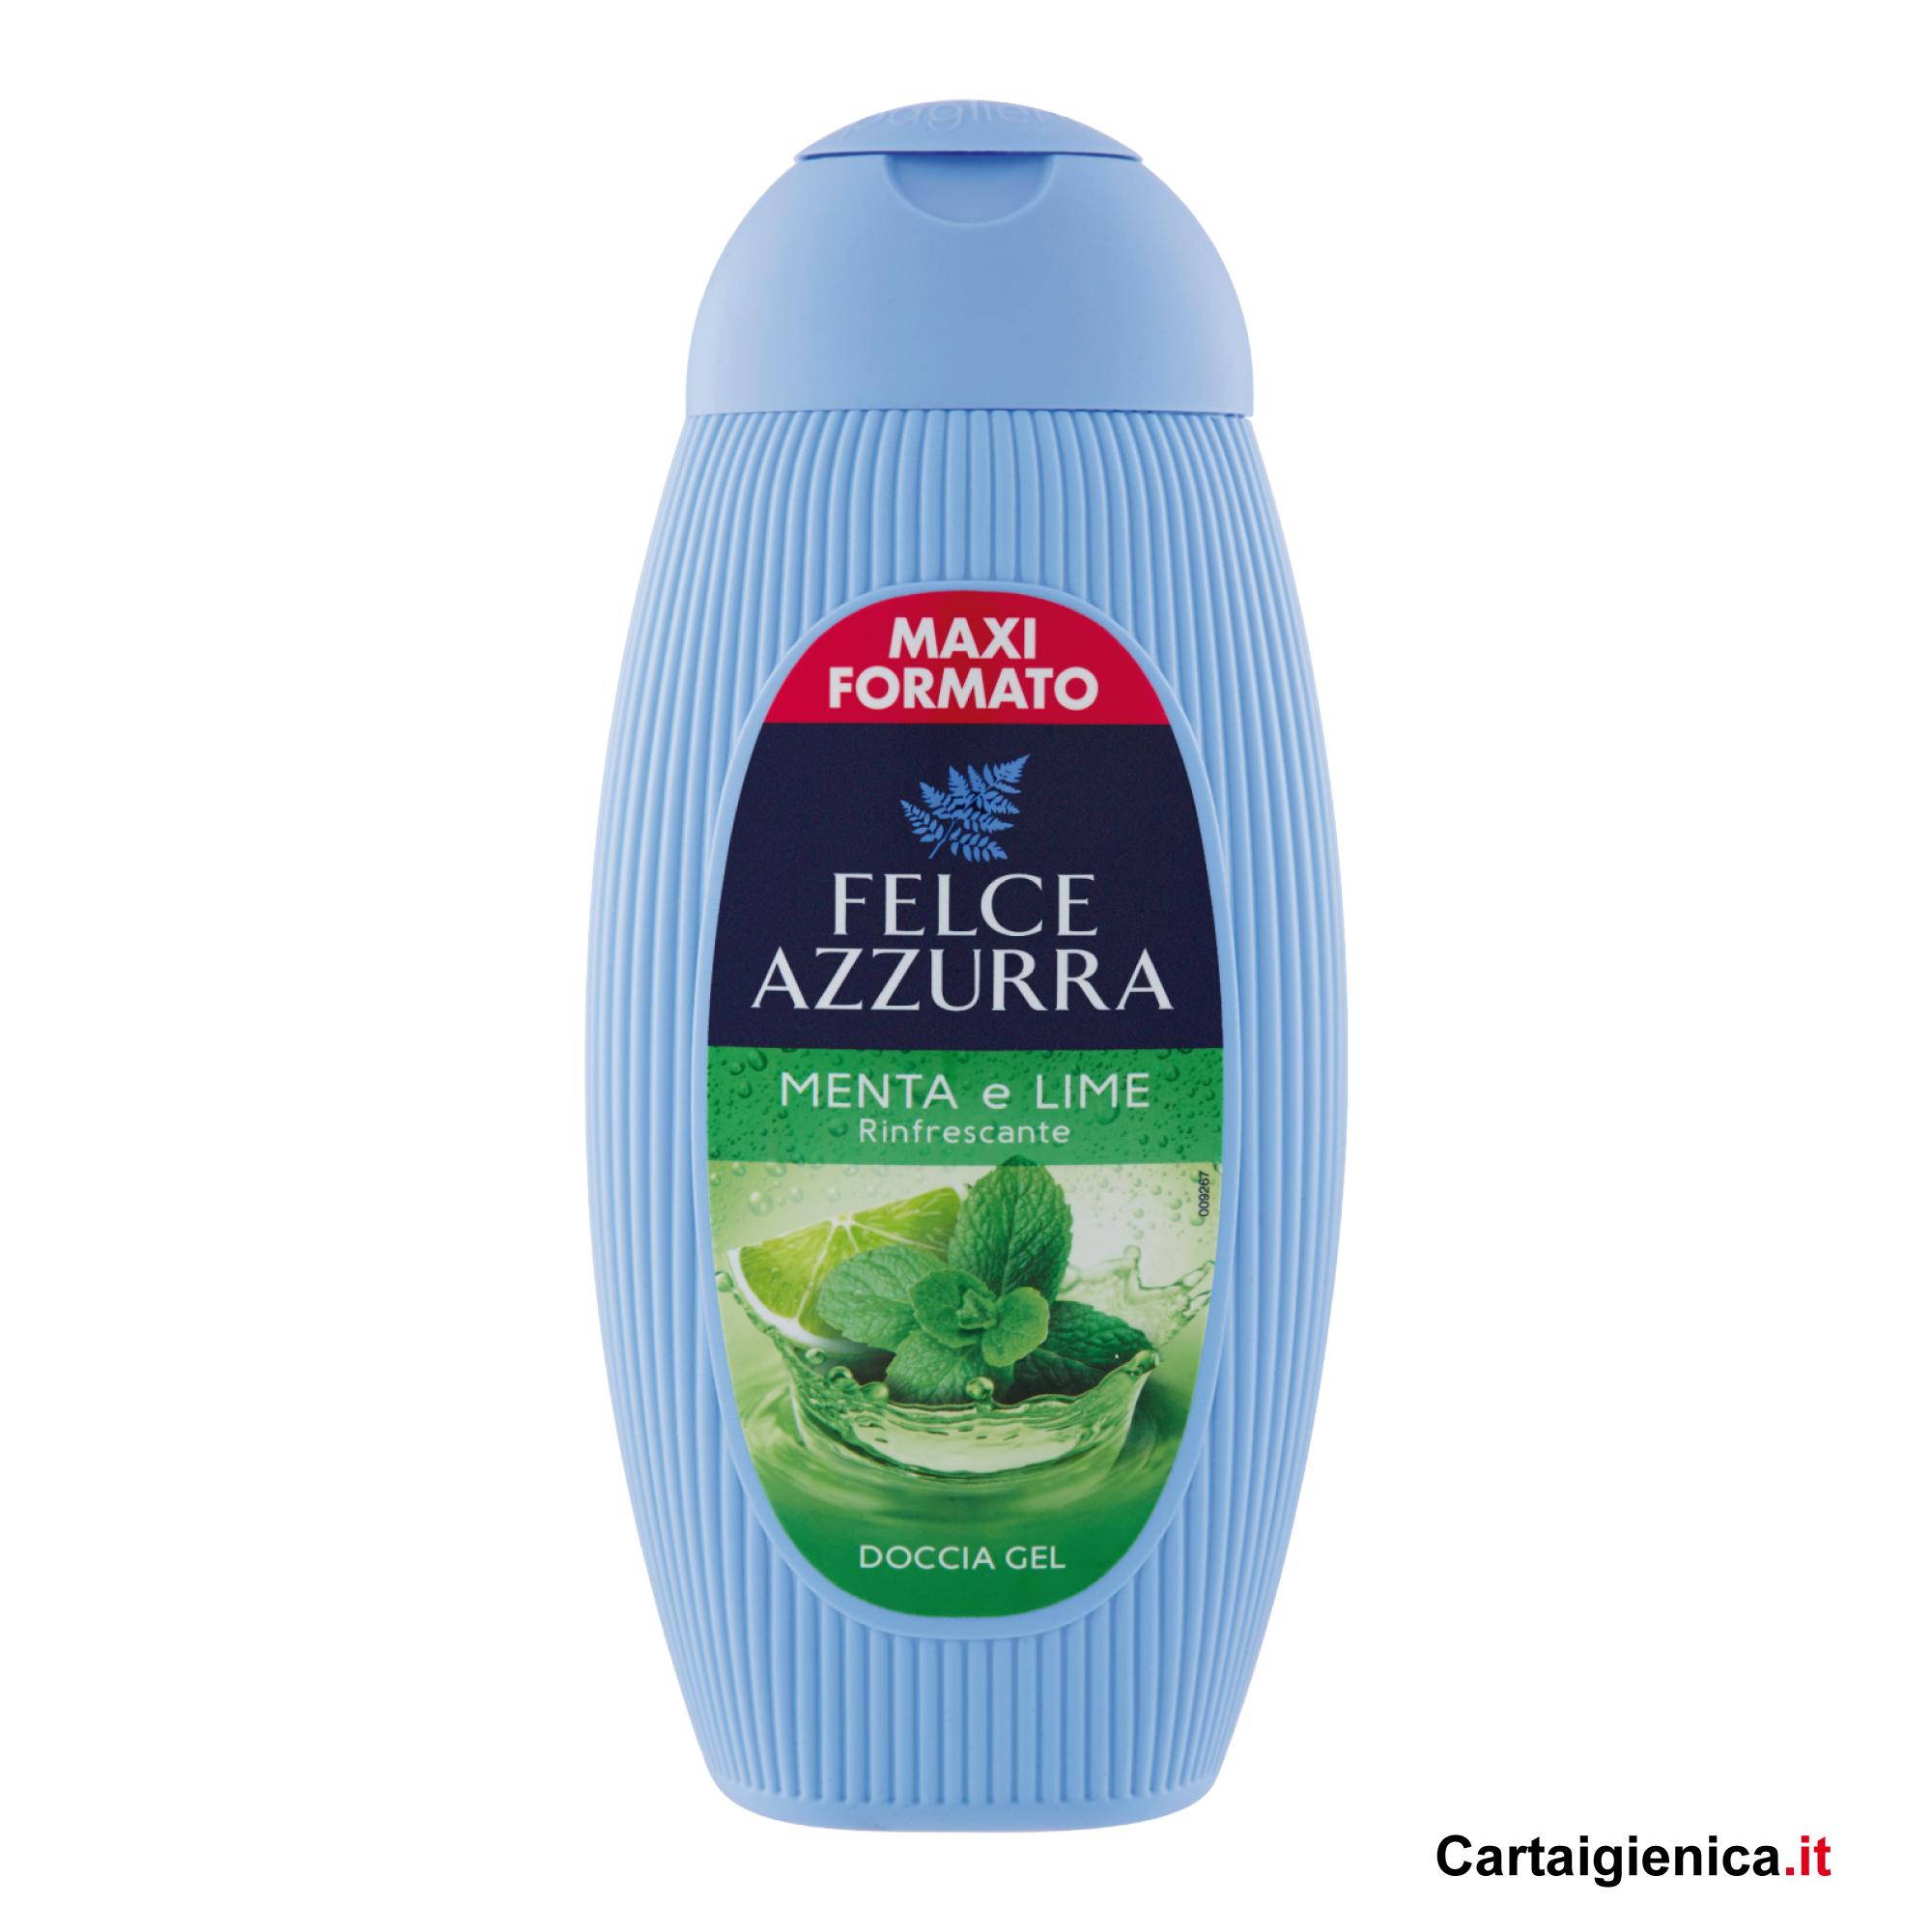 felce azzurra doccia gel menta e lime 400 ml